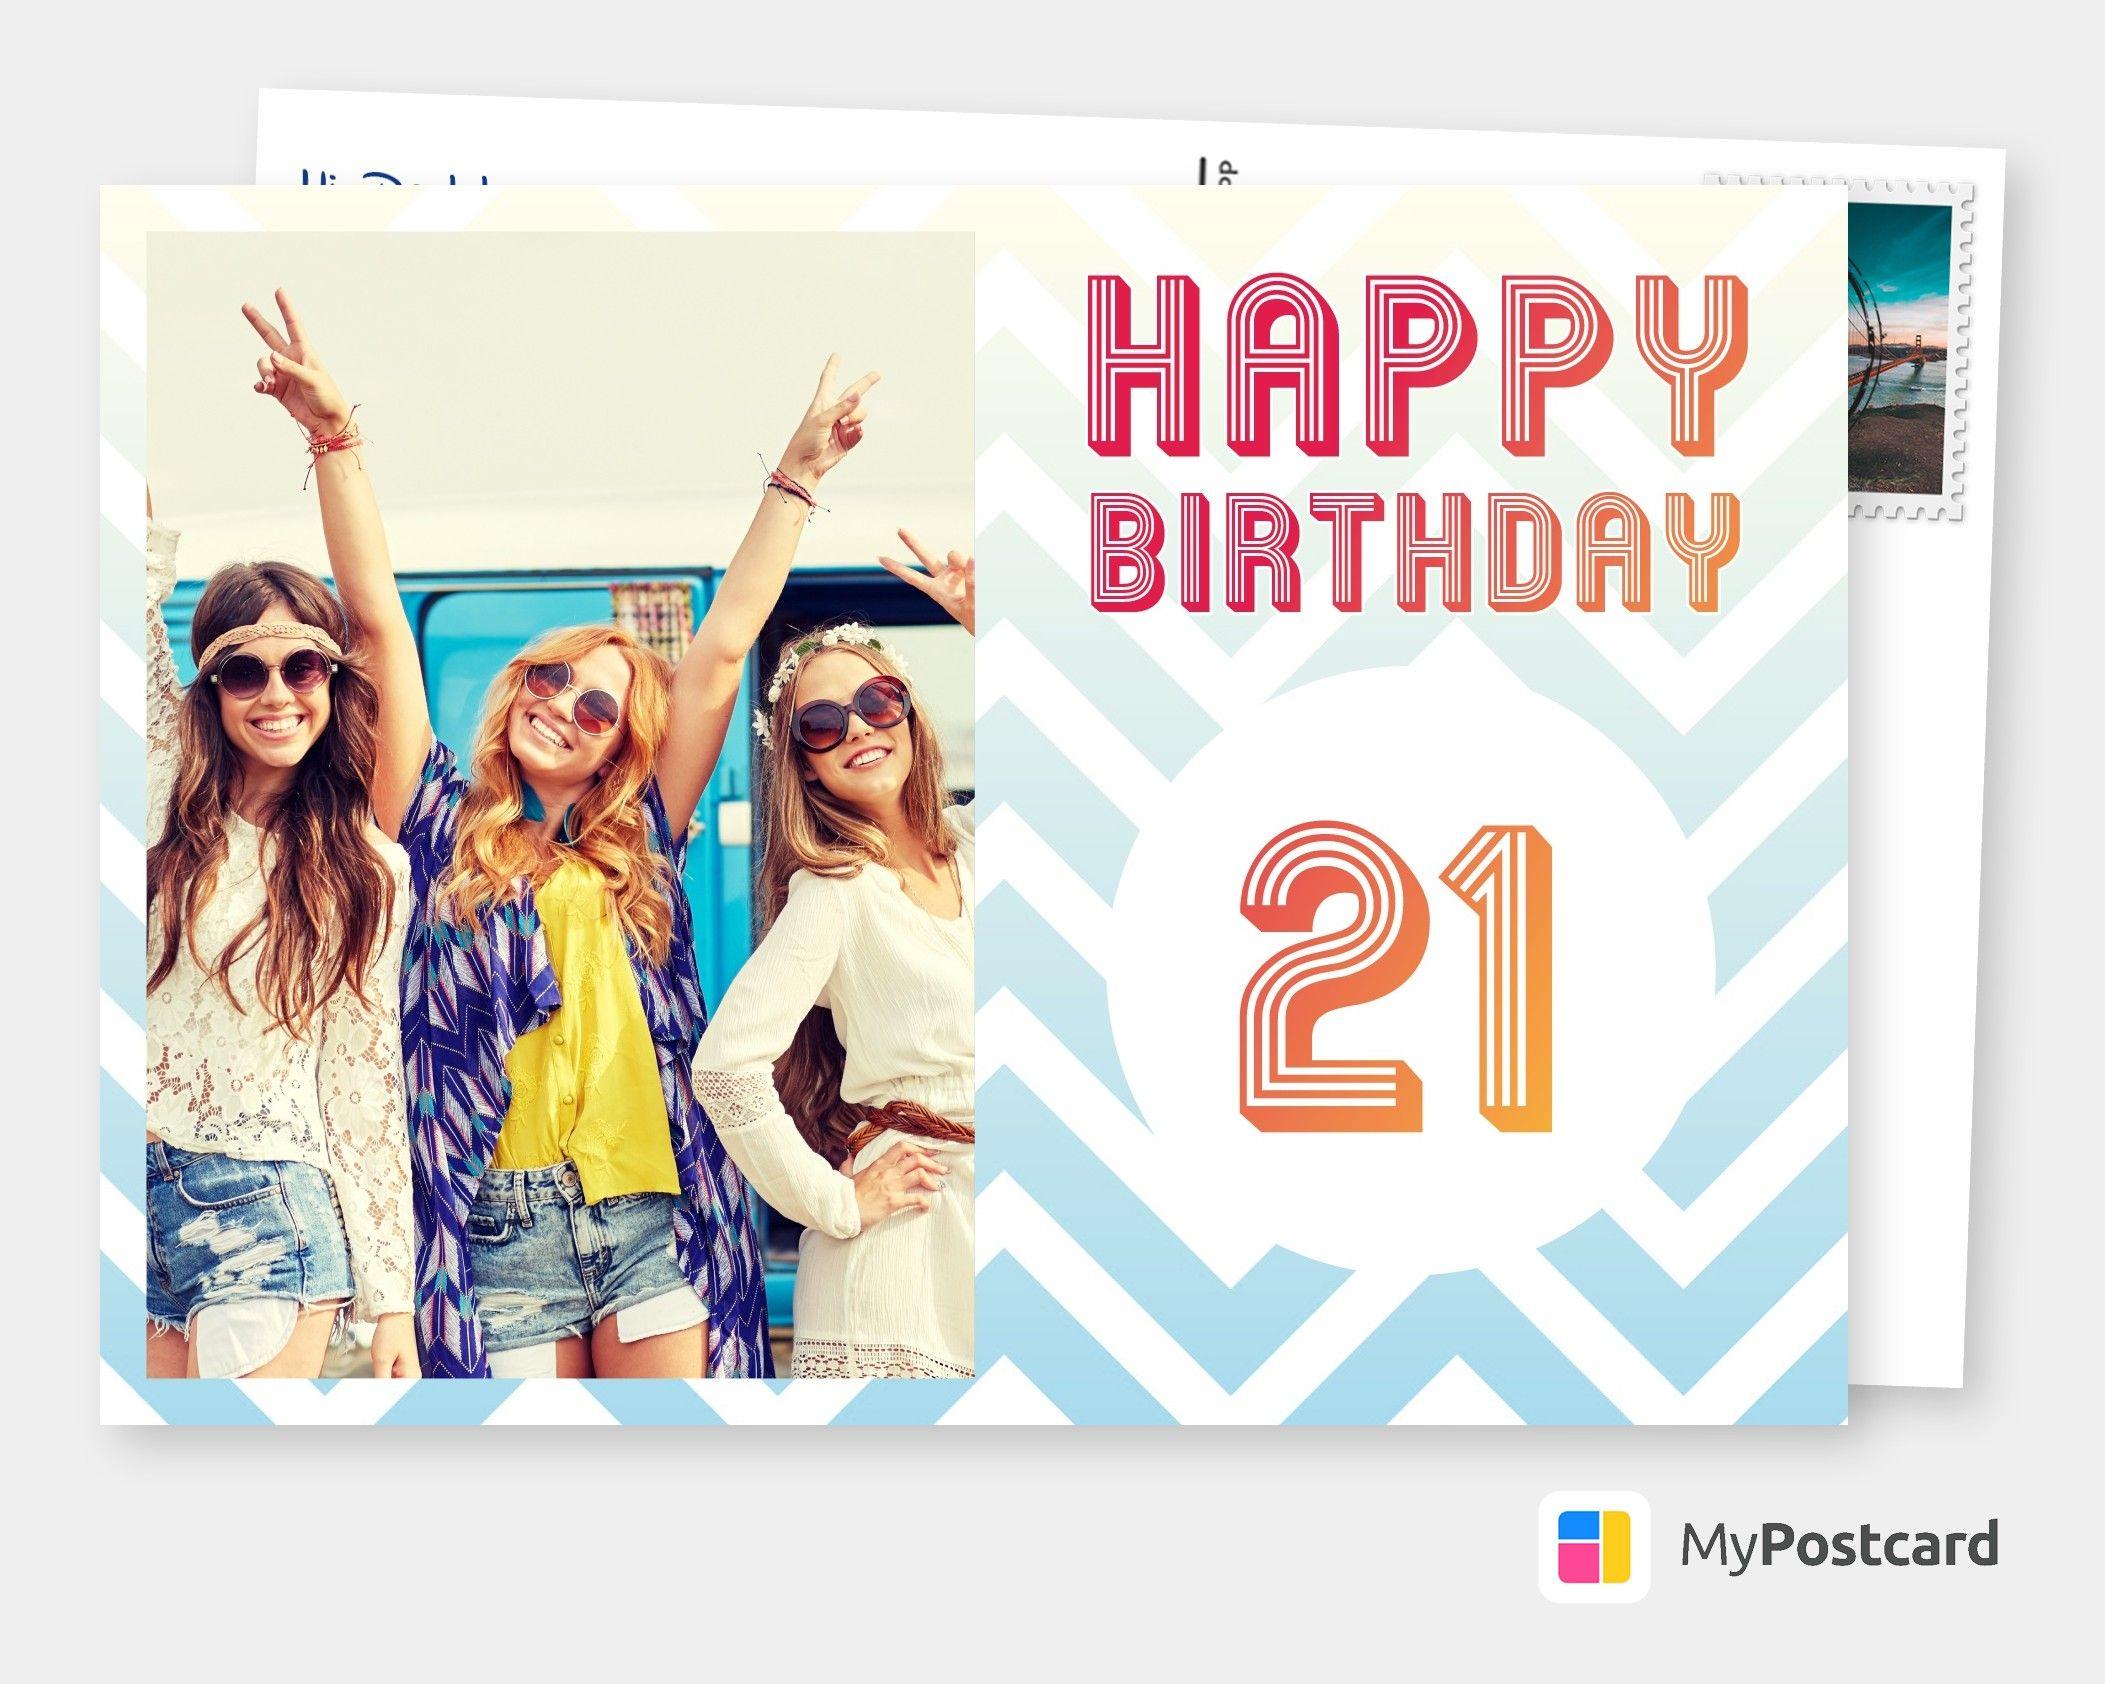 Geburtstagsgrusse Bilder Karten Home Facebook